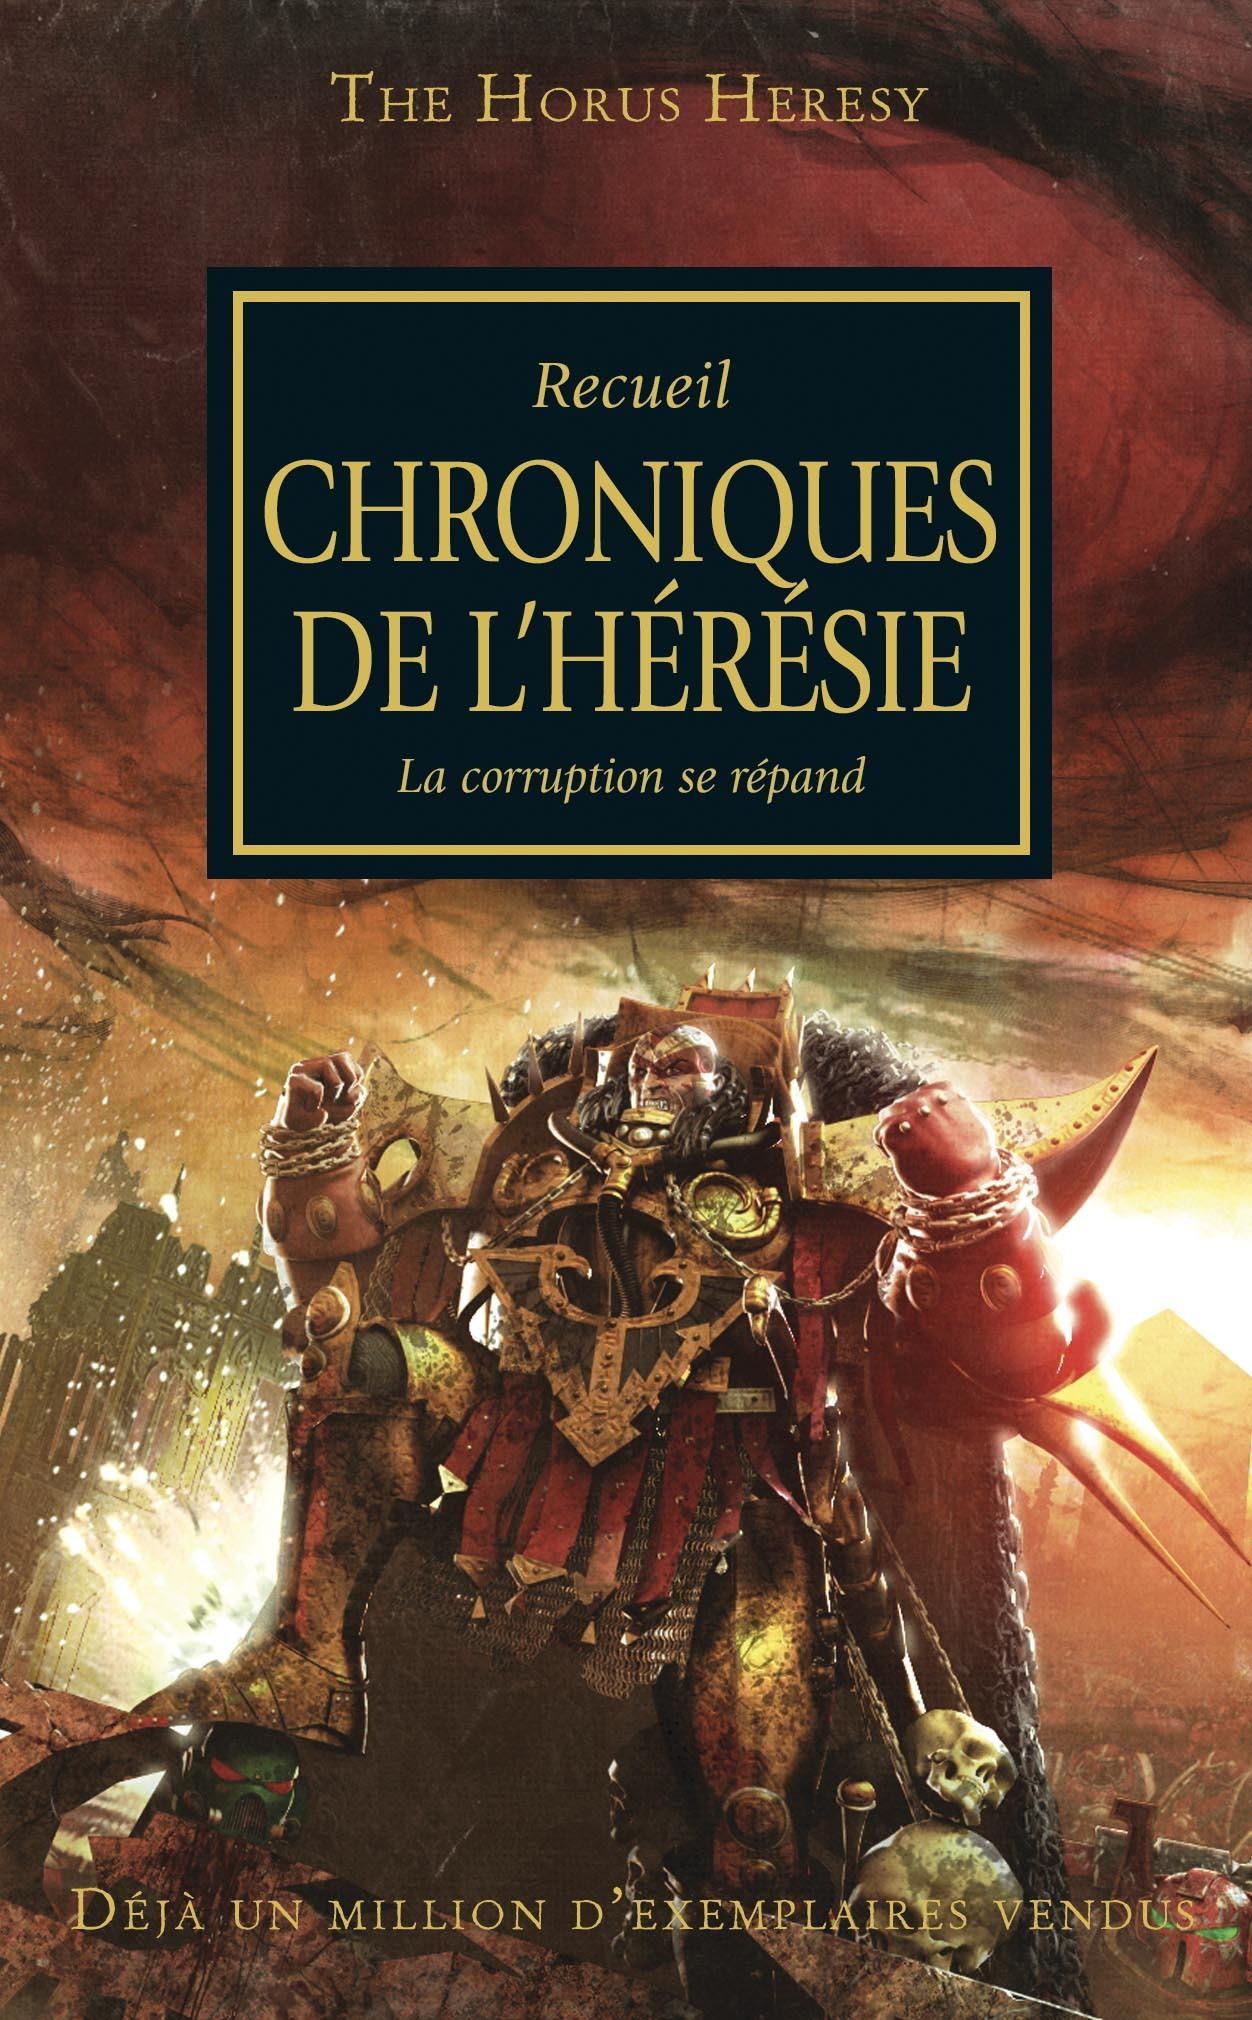 CHRONIQUES D'HERESIE